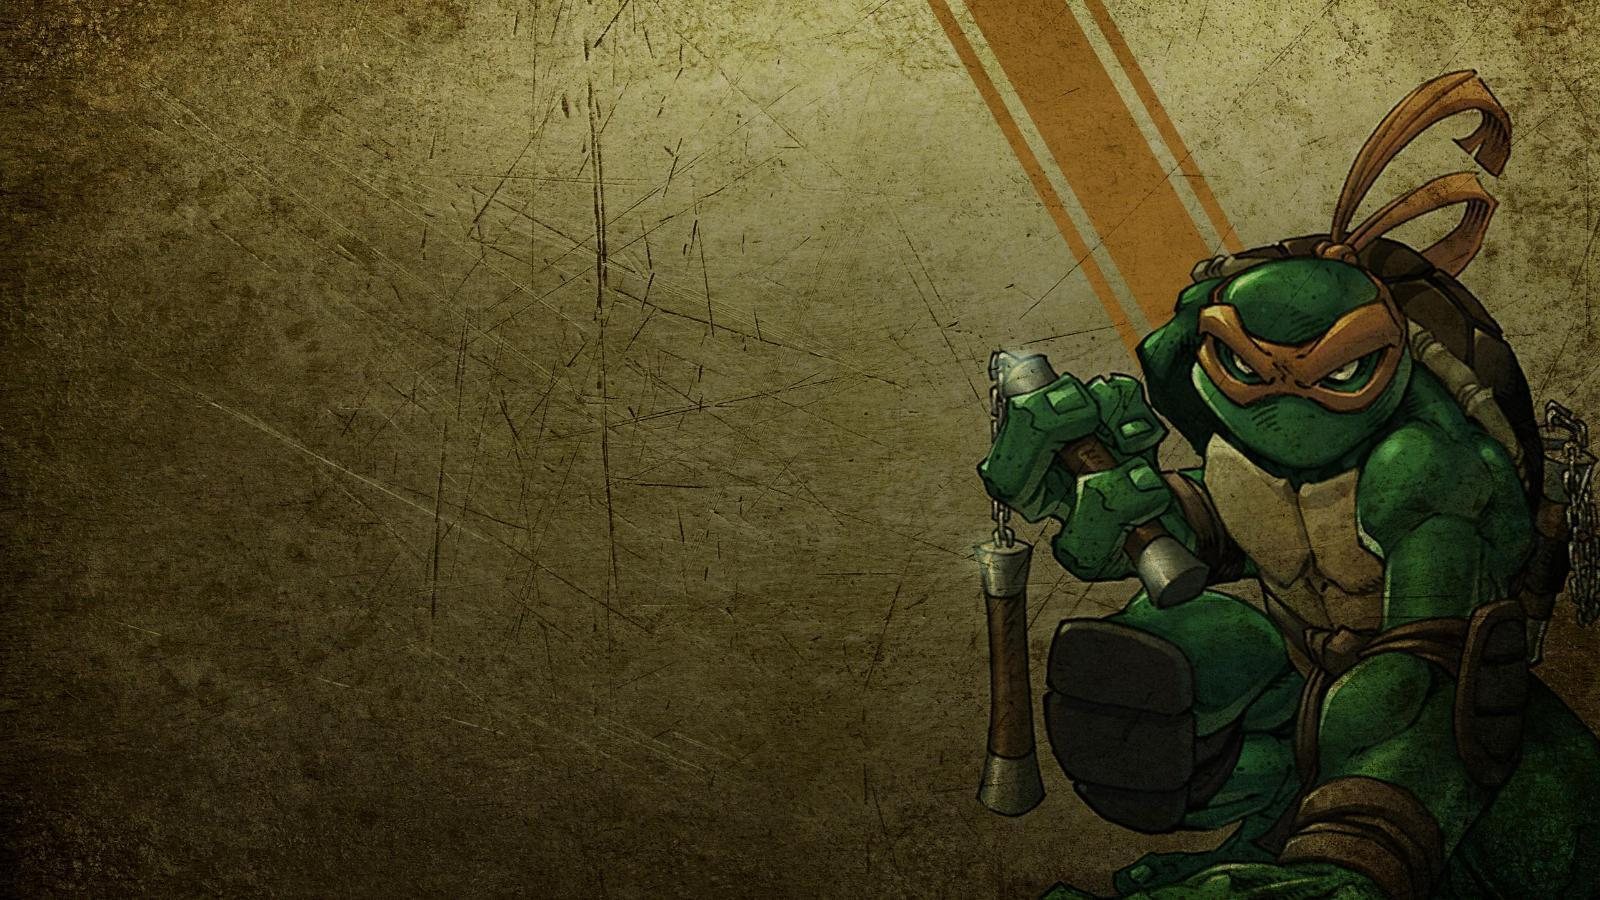 Ninja turtles michelangelo - photo#11